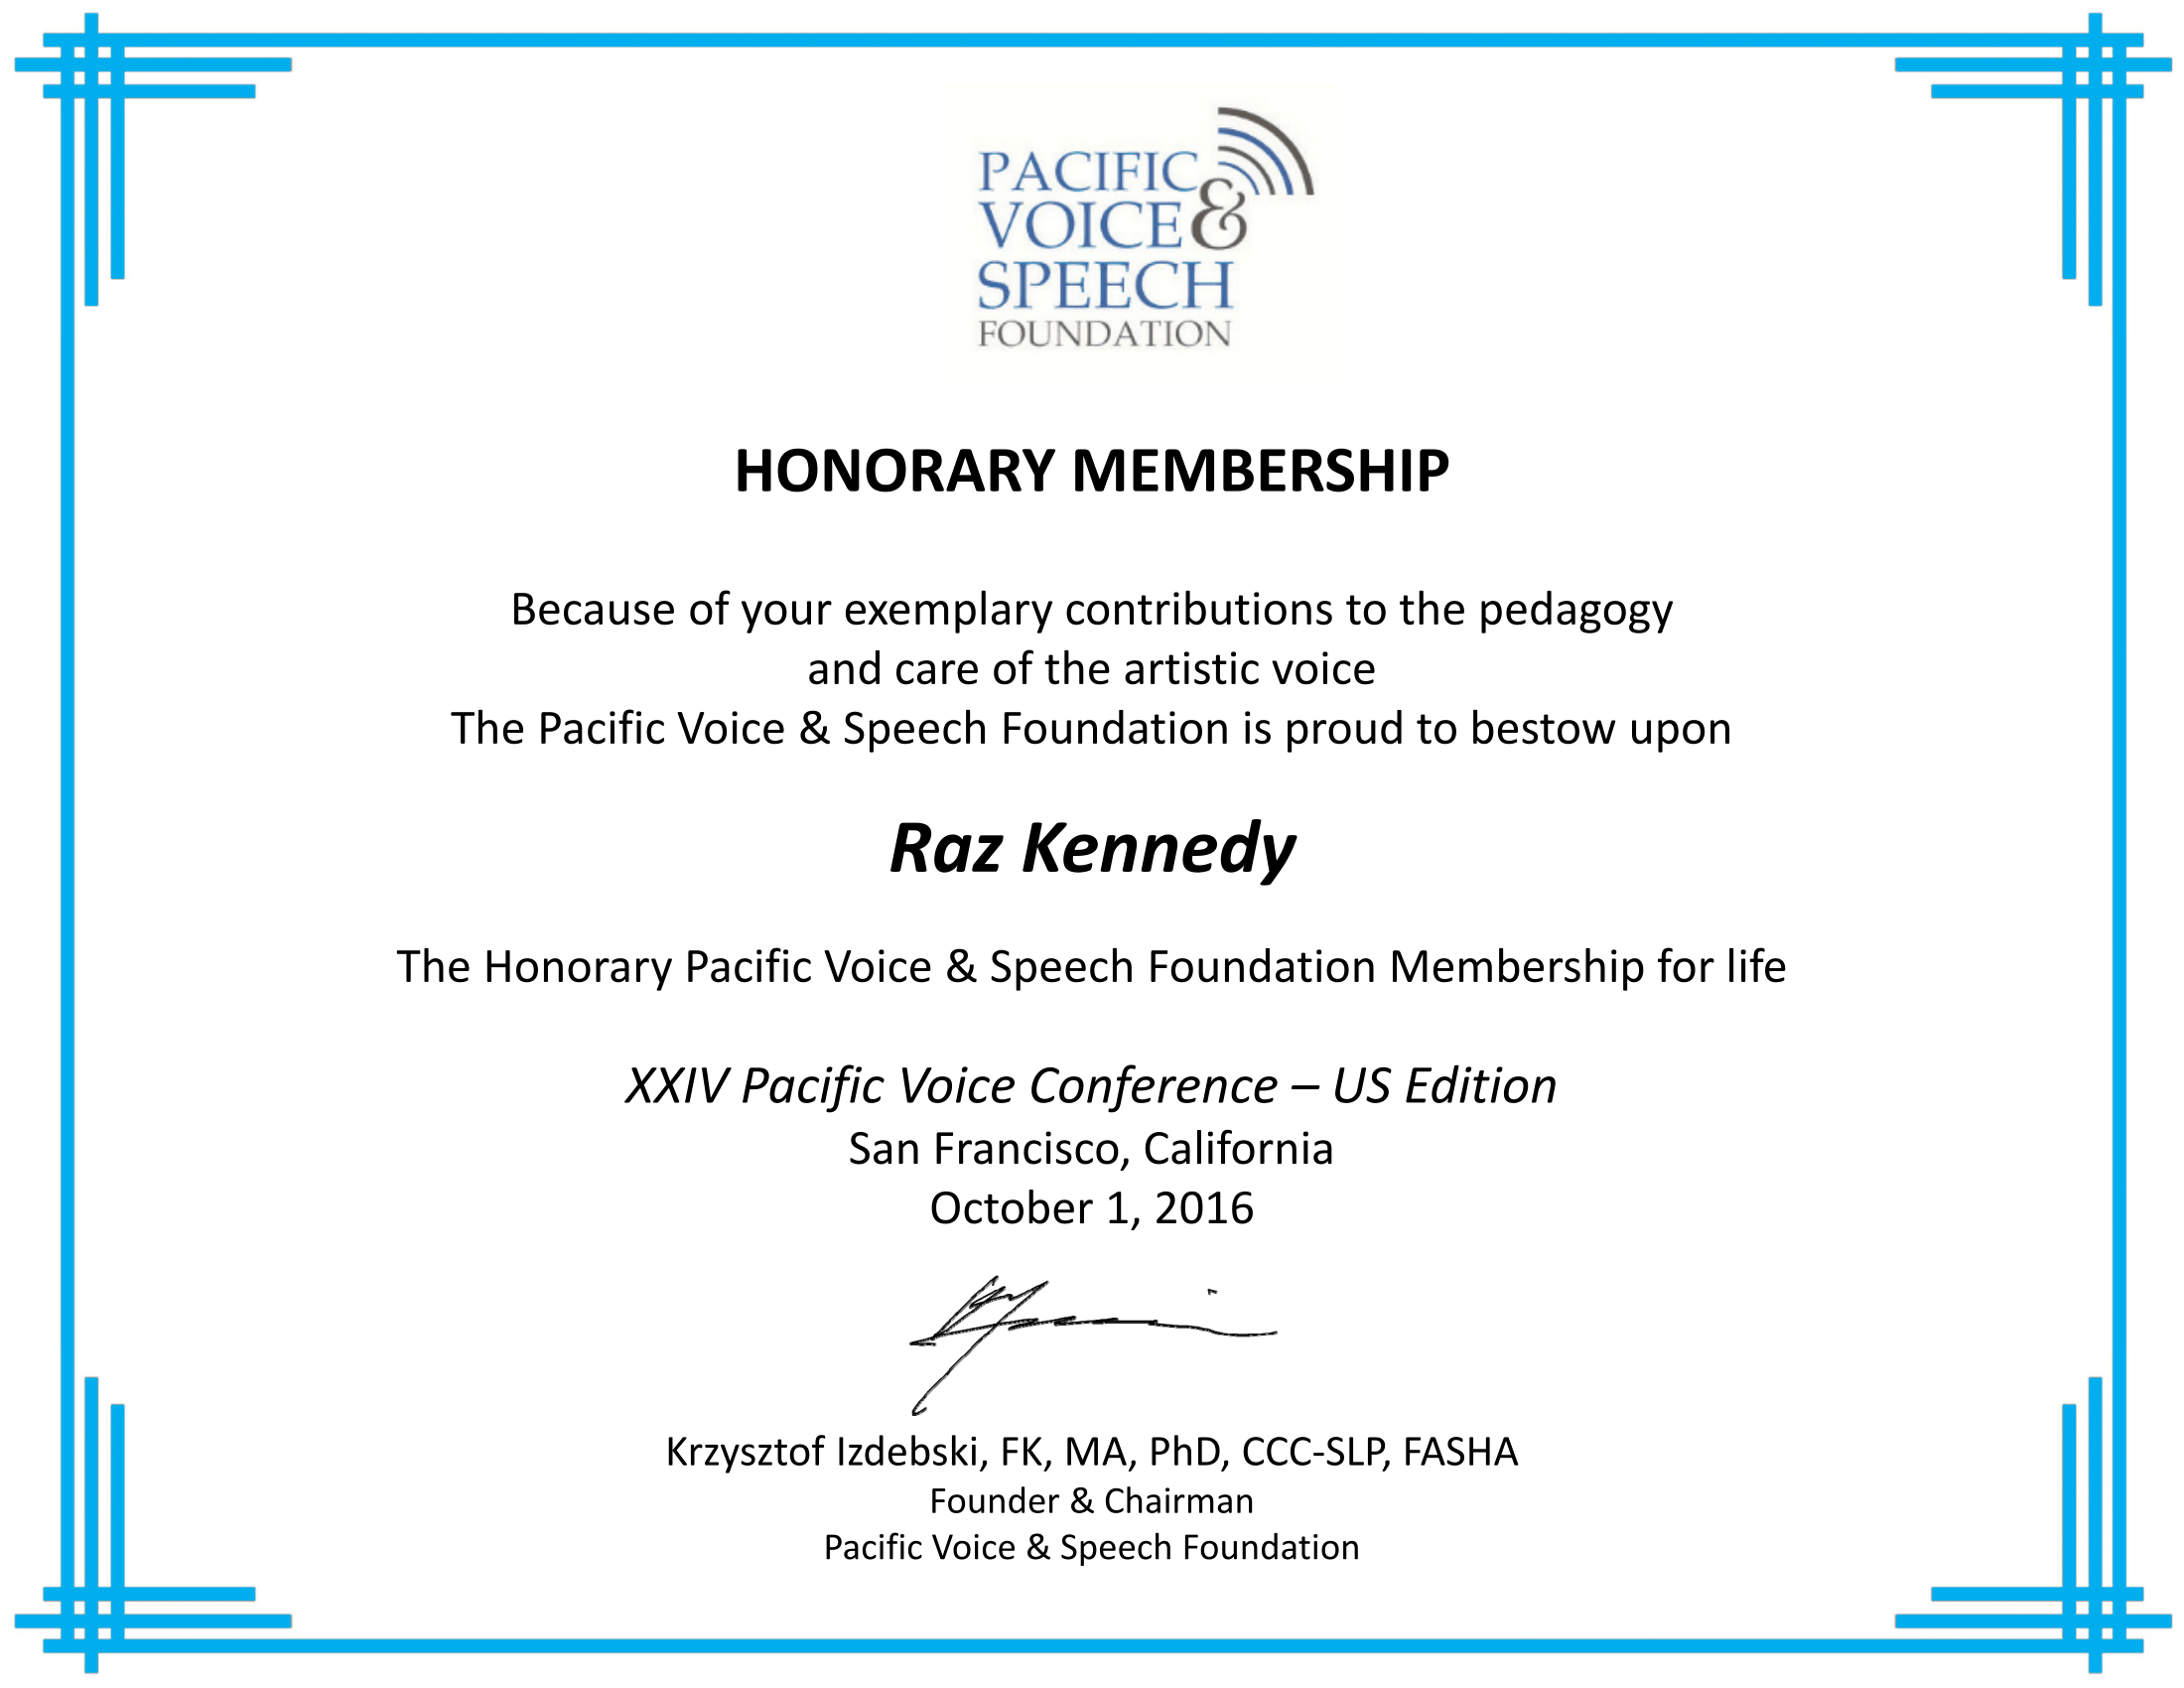 Honorary Membership_Raz Kennedy-1.png